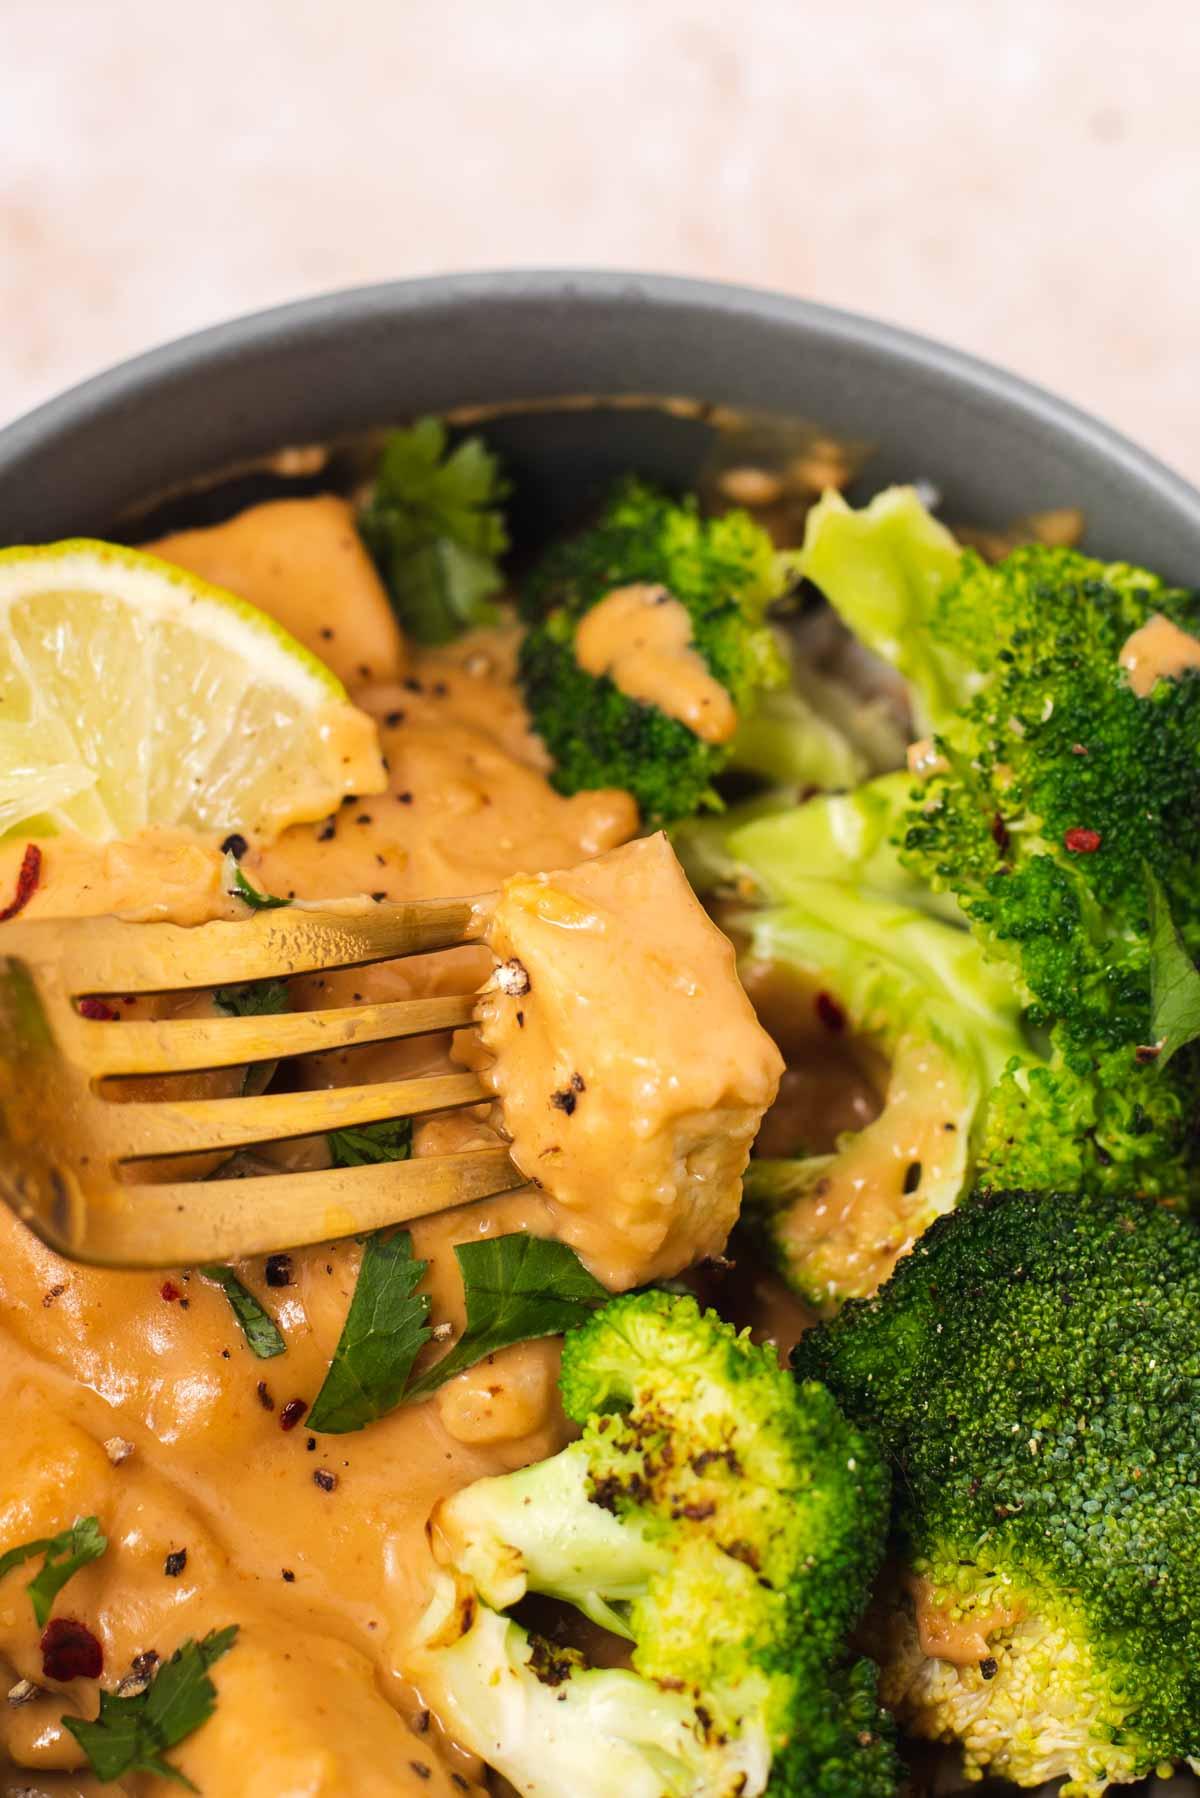 Gold fork piercing piece of peanut tofu